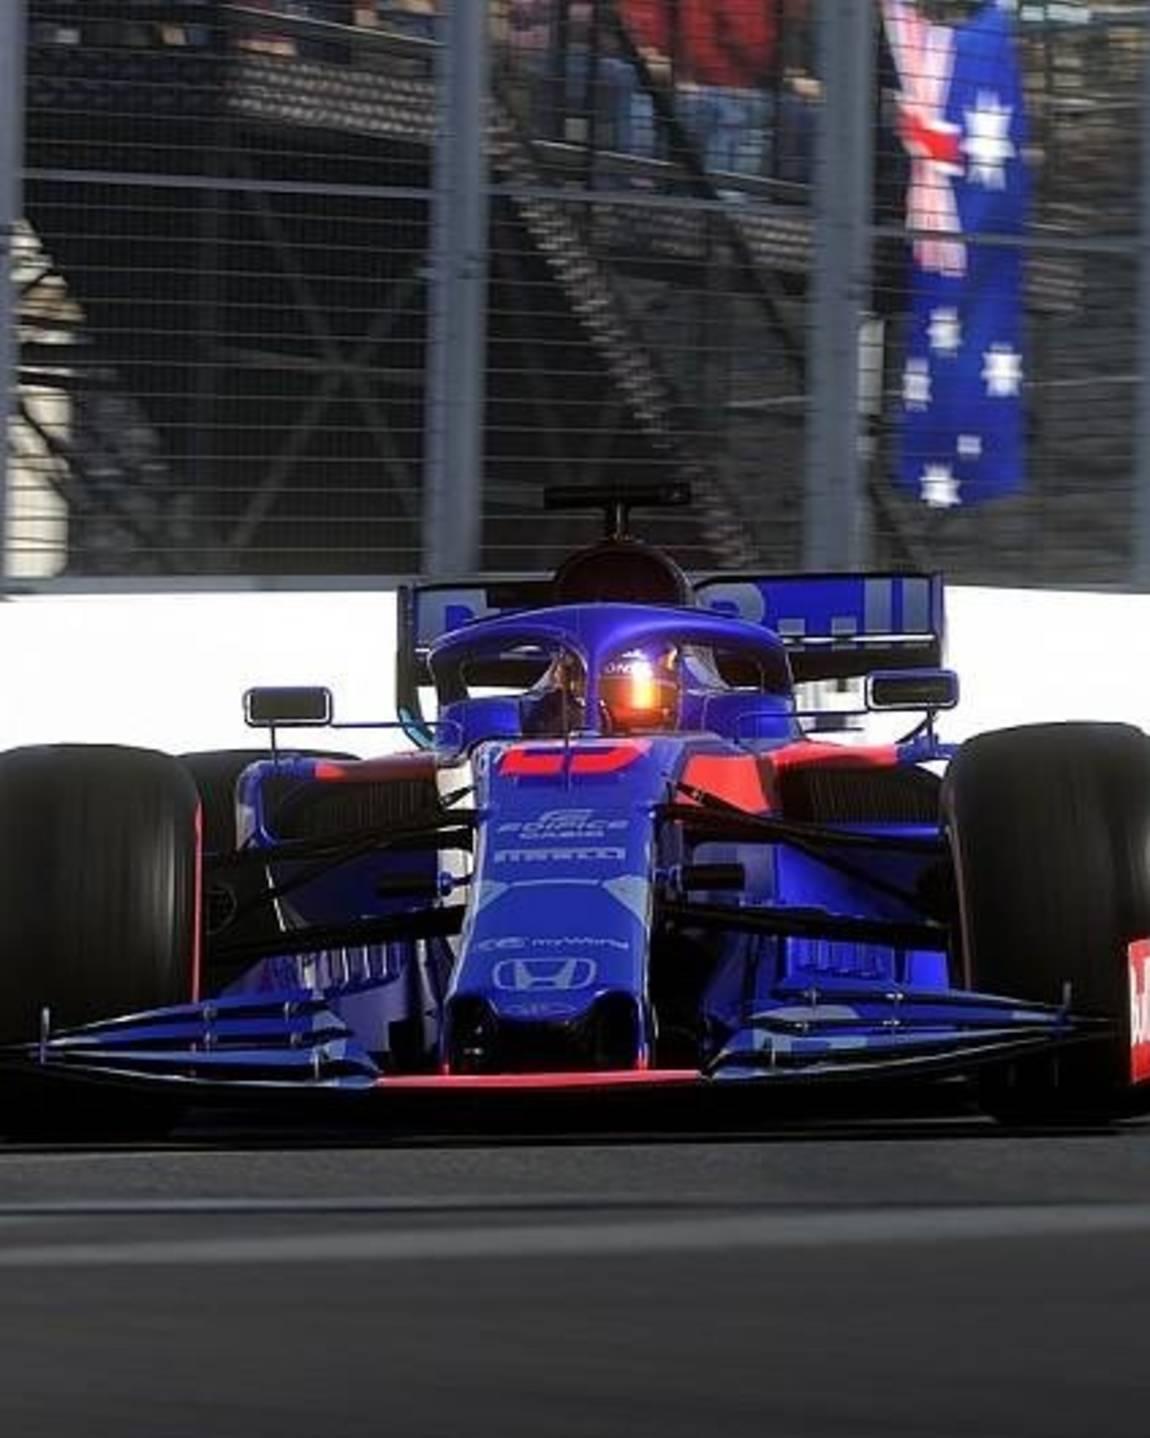 F1 2020 game setups